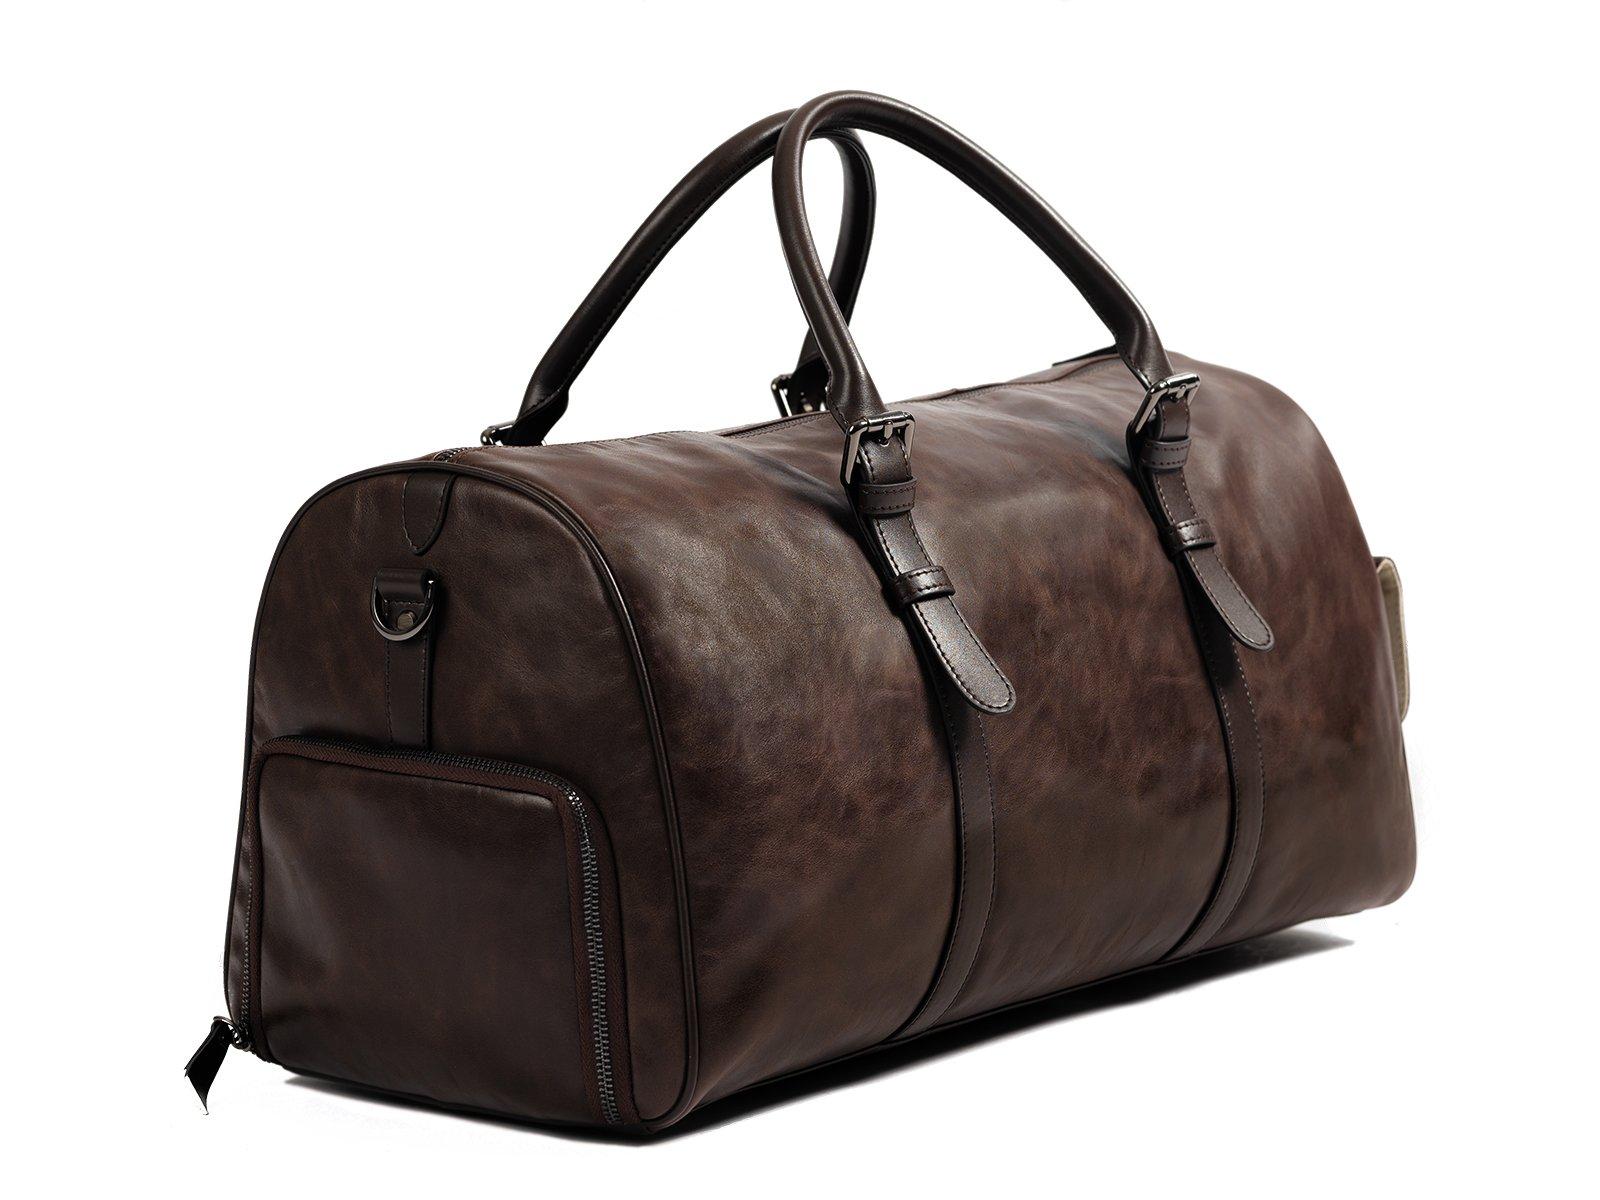 kingsman dark brown leather duffle bag